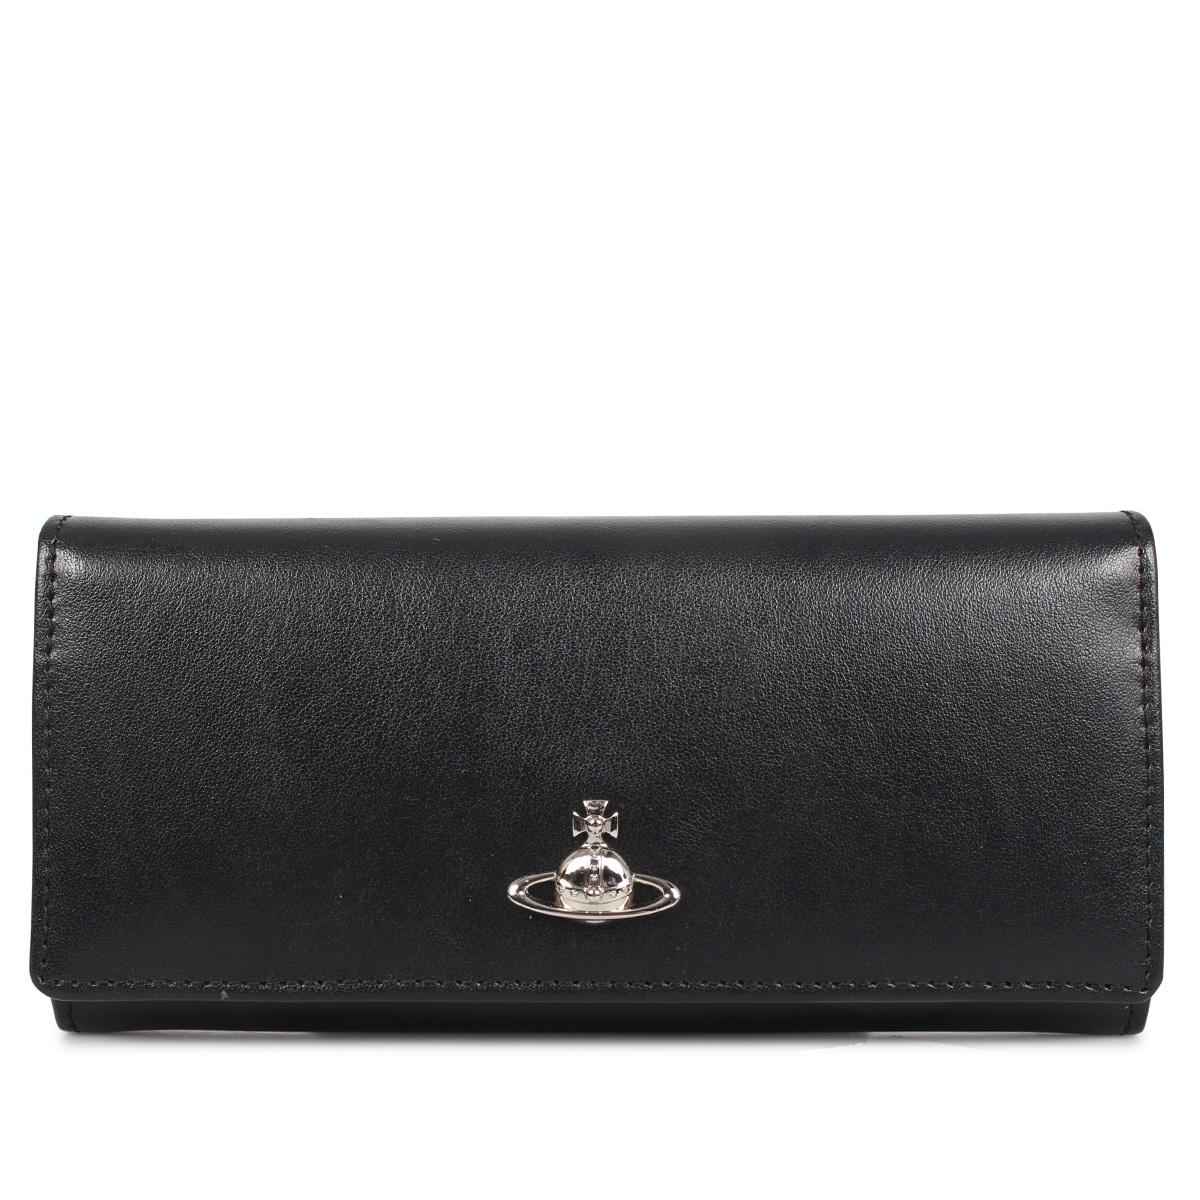 Vivienne Westwood PIMLICO WOMAN CREDIT CARD ヴィヴィアンウエストウッド 財布 長財布 レディース  ブラック 黒 51120005 [3/12 新入荷]